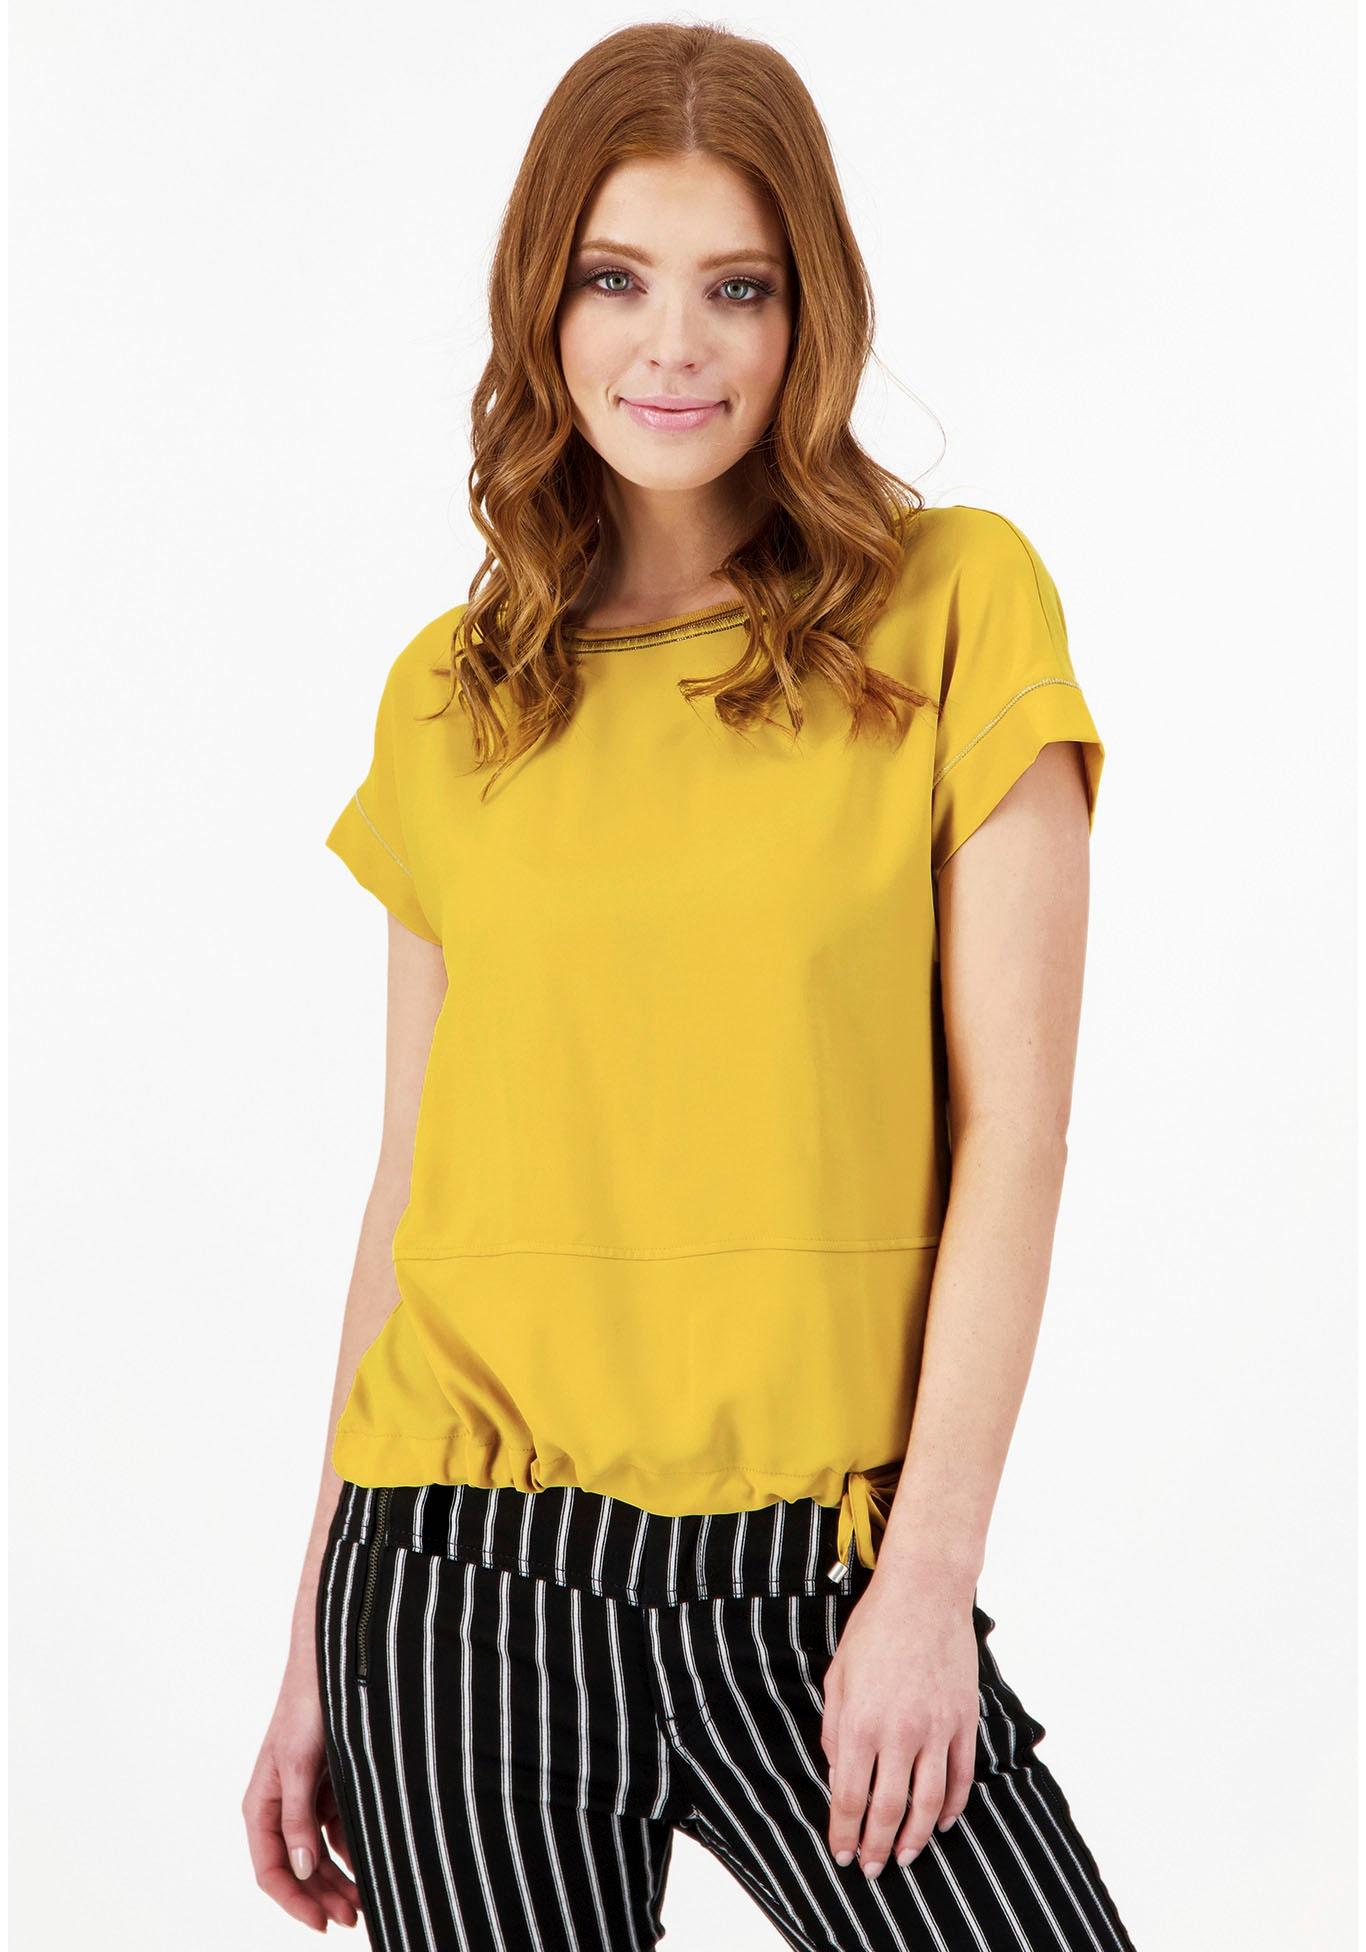 monari shirtbluse Shirtbluse von MONARI